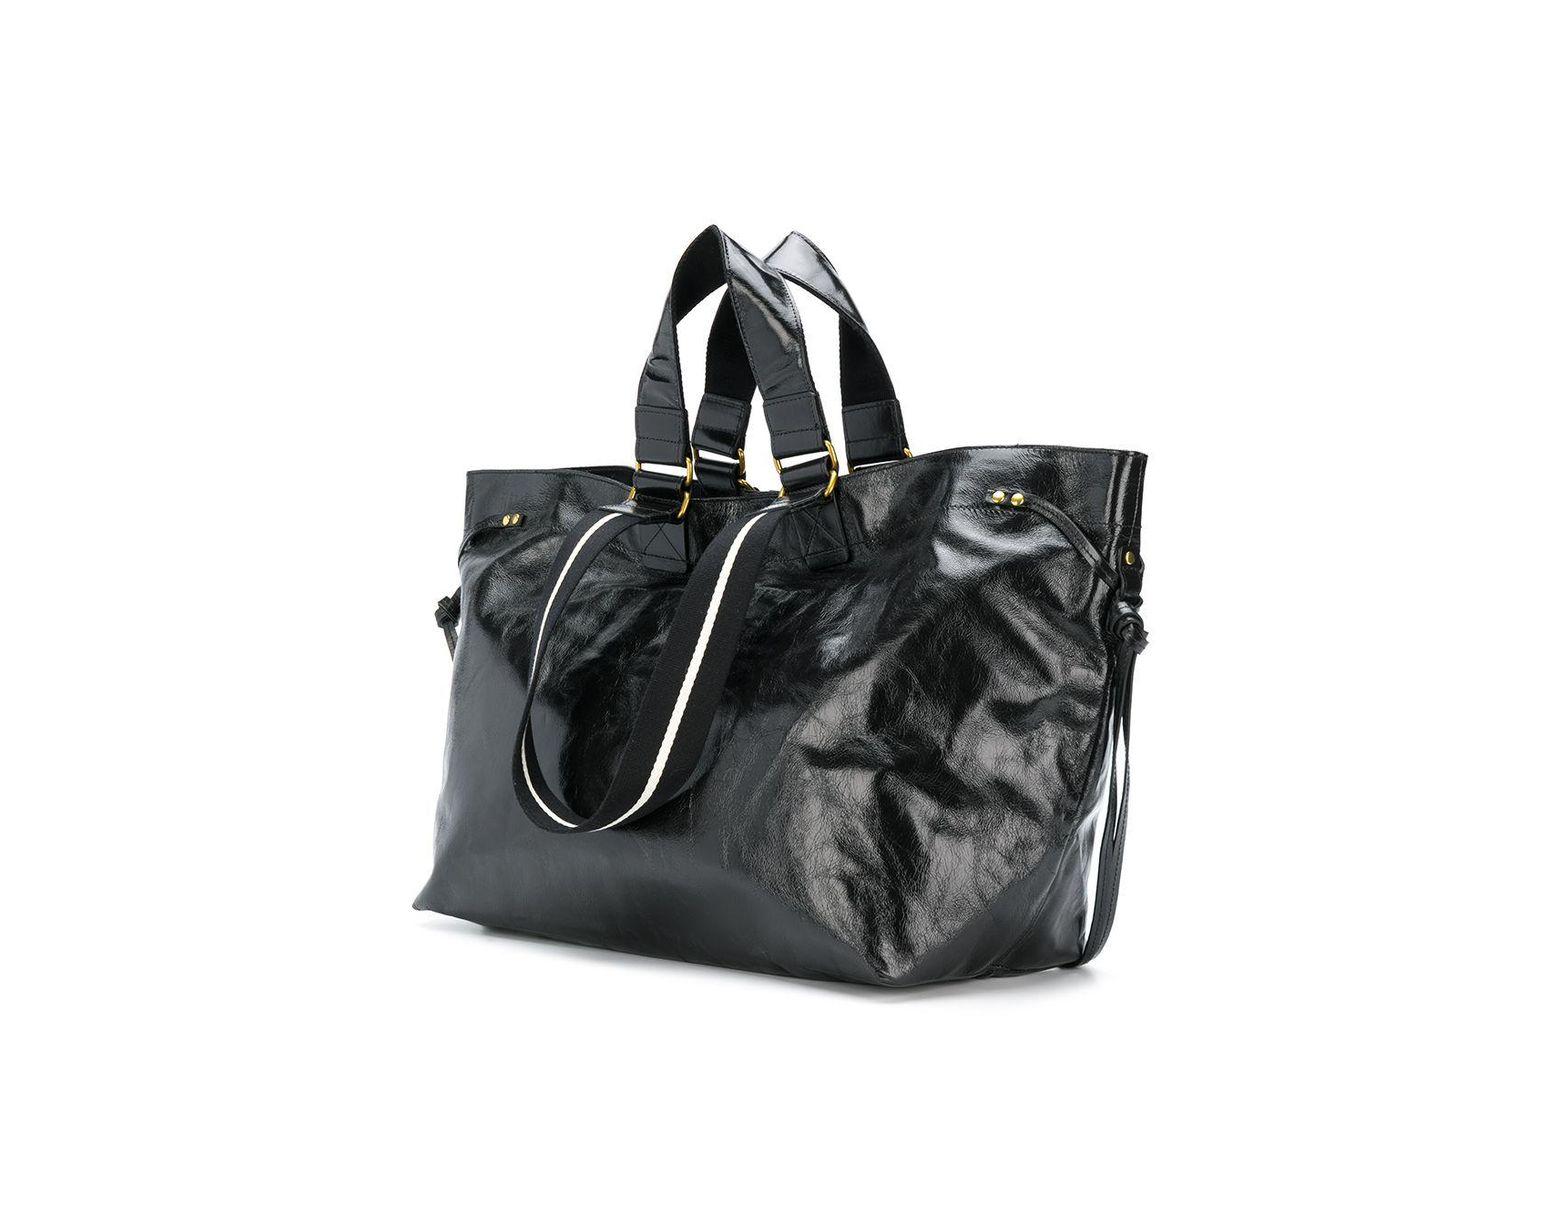 7624d2ed5 Isabel Marant Big Tote Bag in Black - Save 36% - Lyst